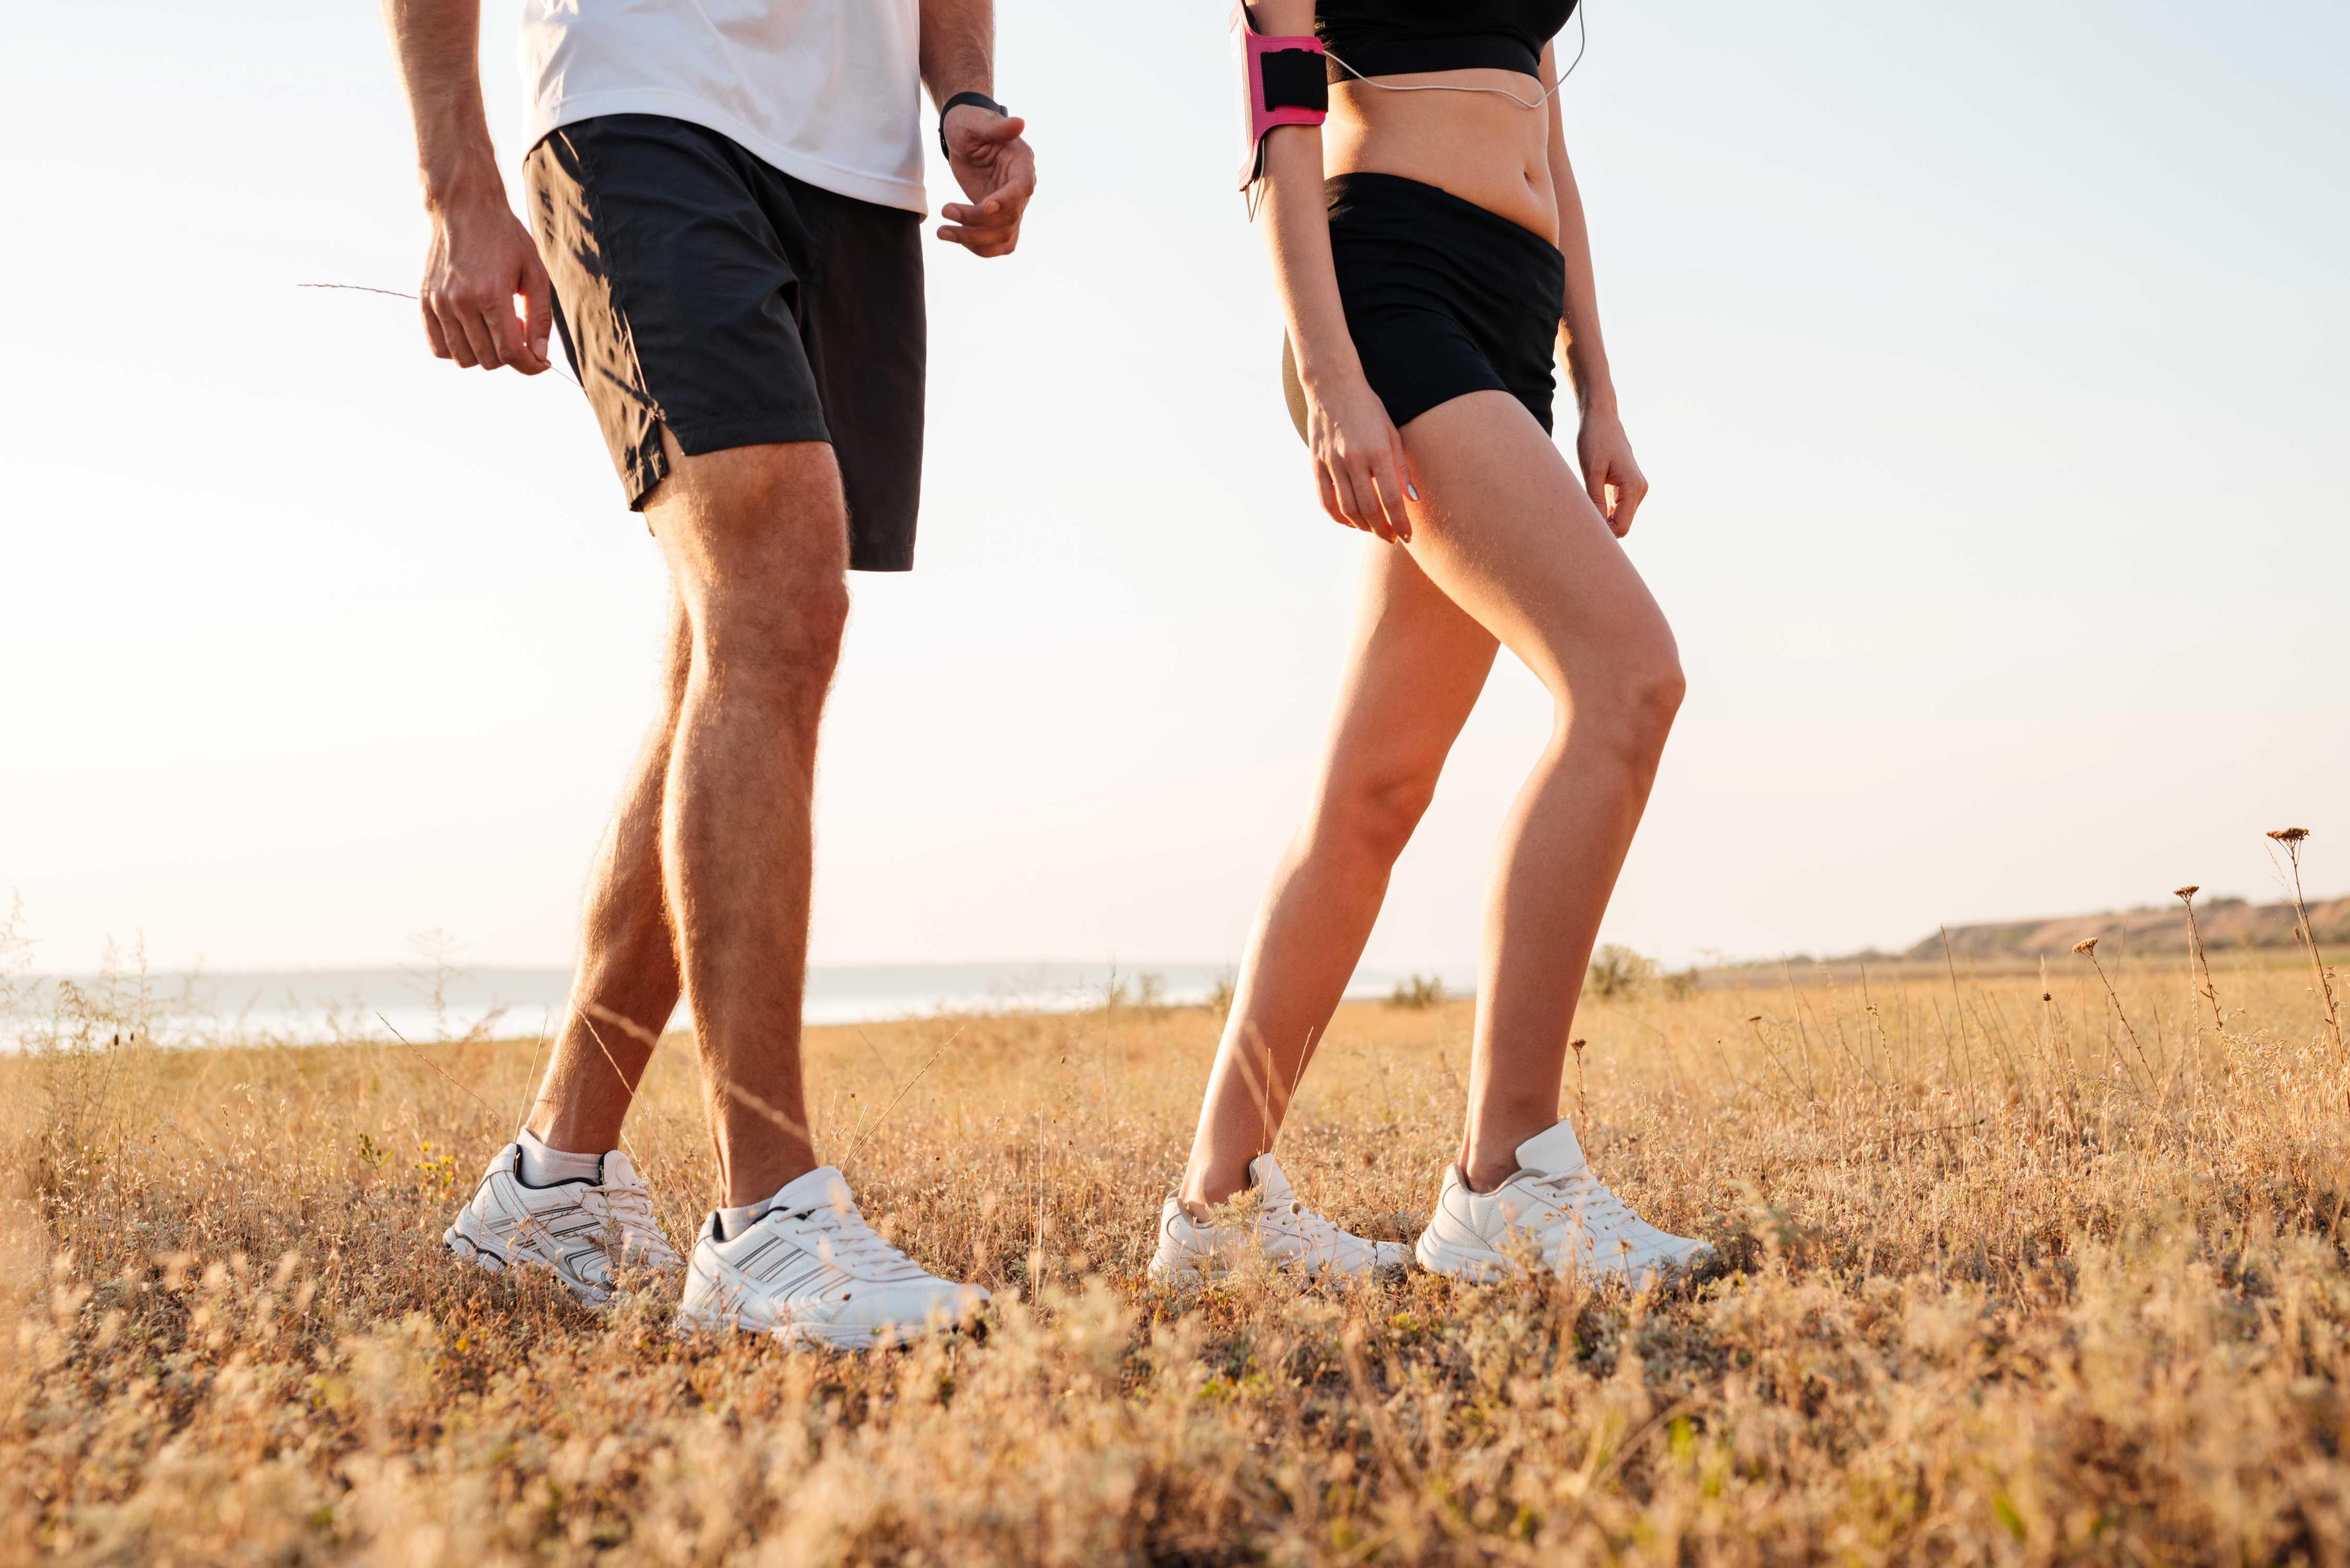 Can Walking Increase Testosterone?